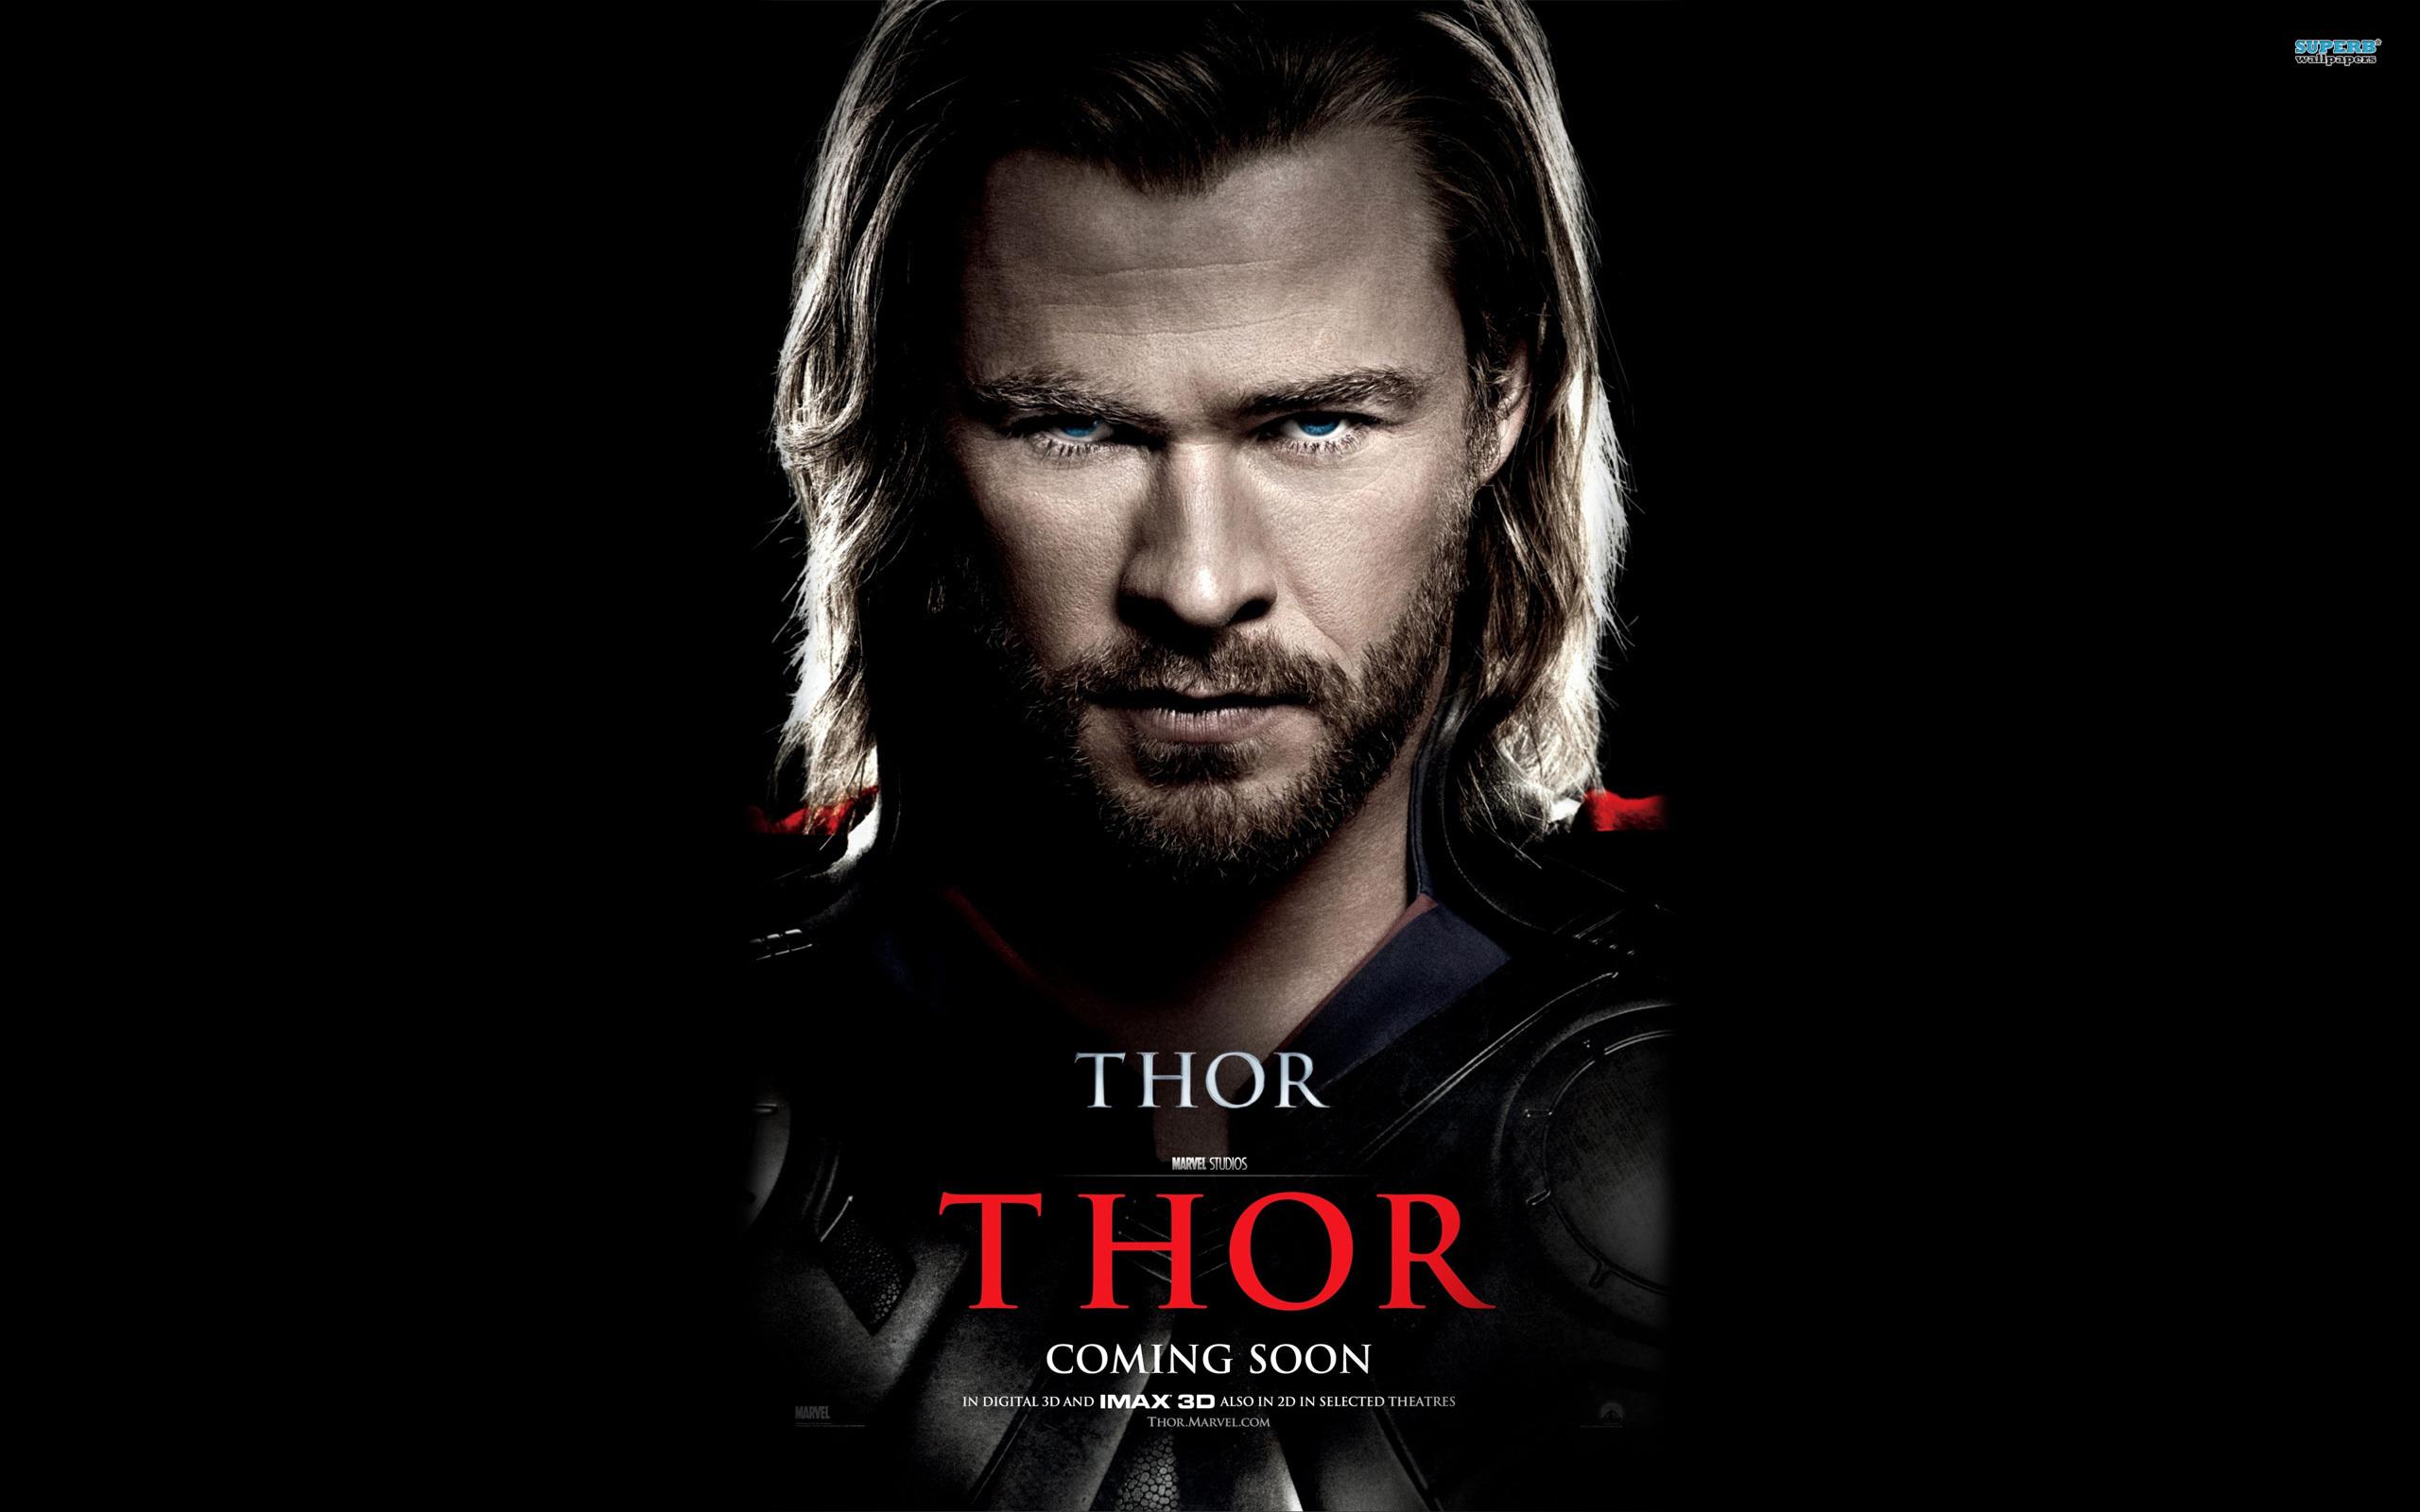 Thor wallpaper 2560x1600 jpg